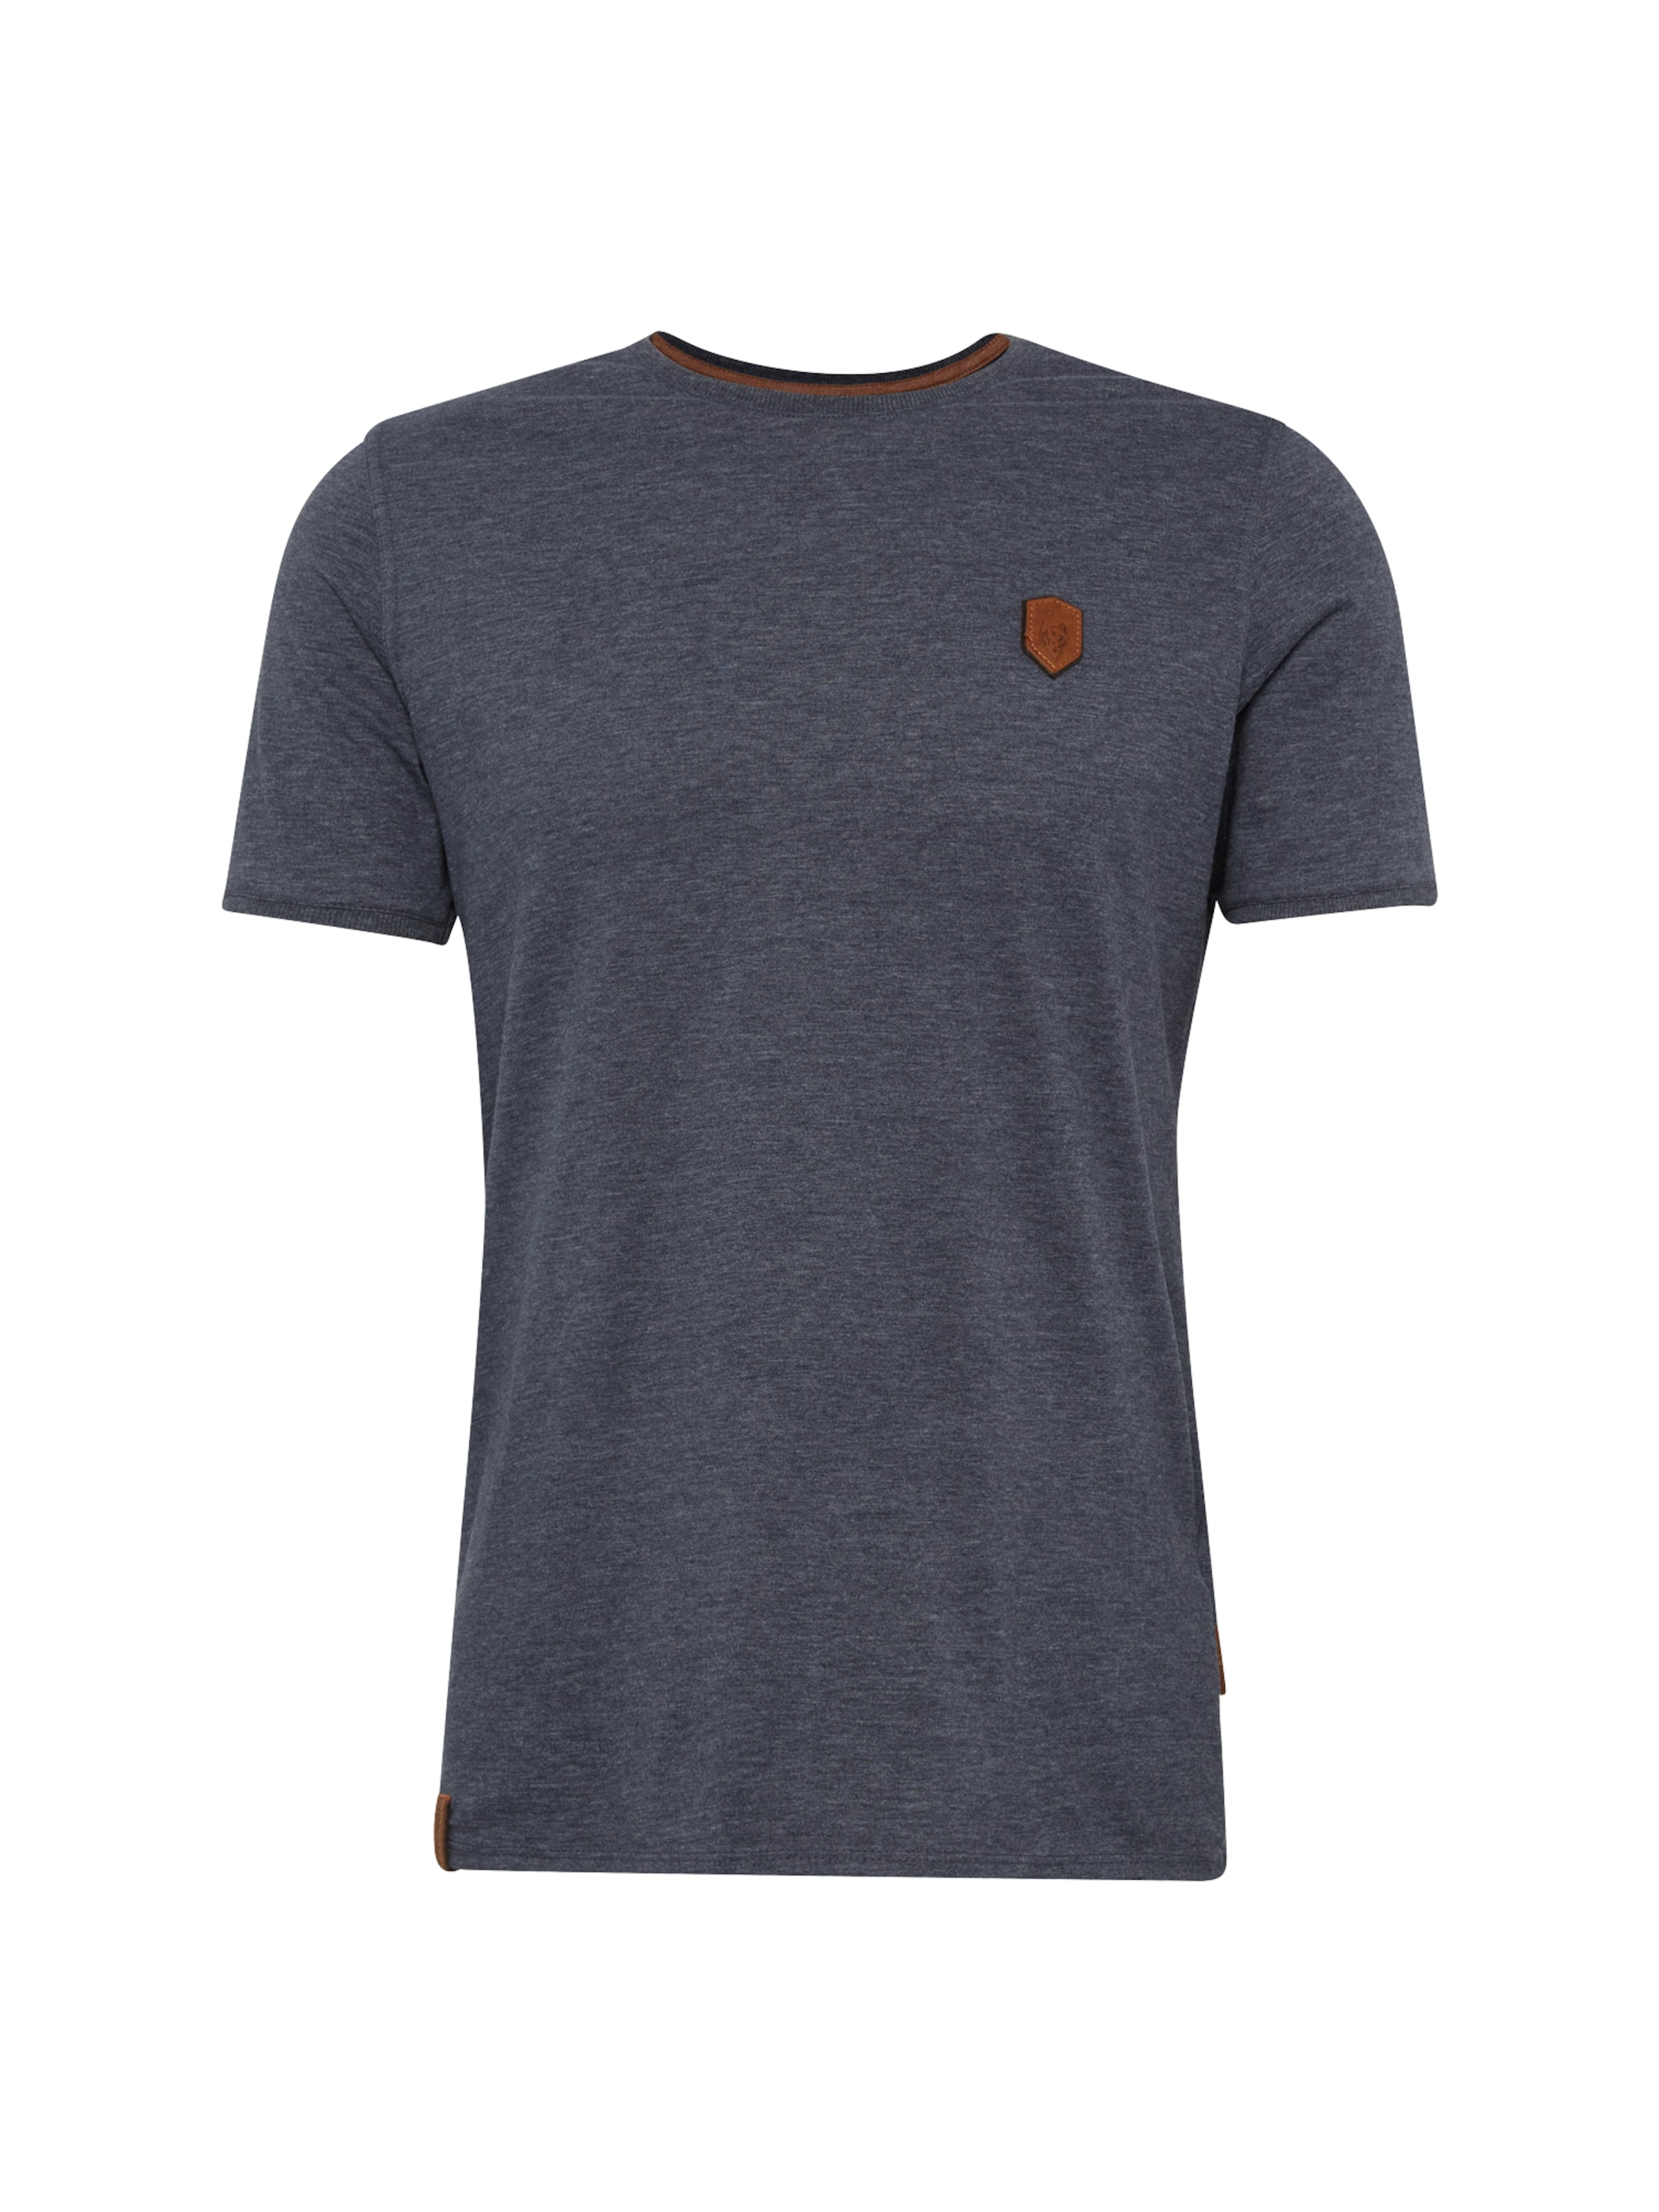 Naketano shirt T 'italienischer In Hengst' Taubenblau tsrhCdQ